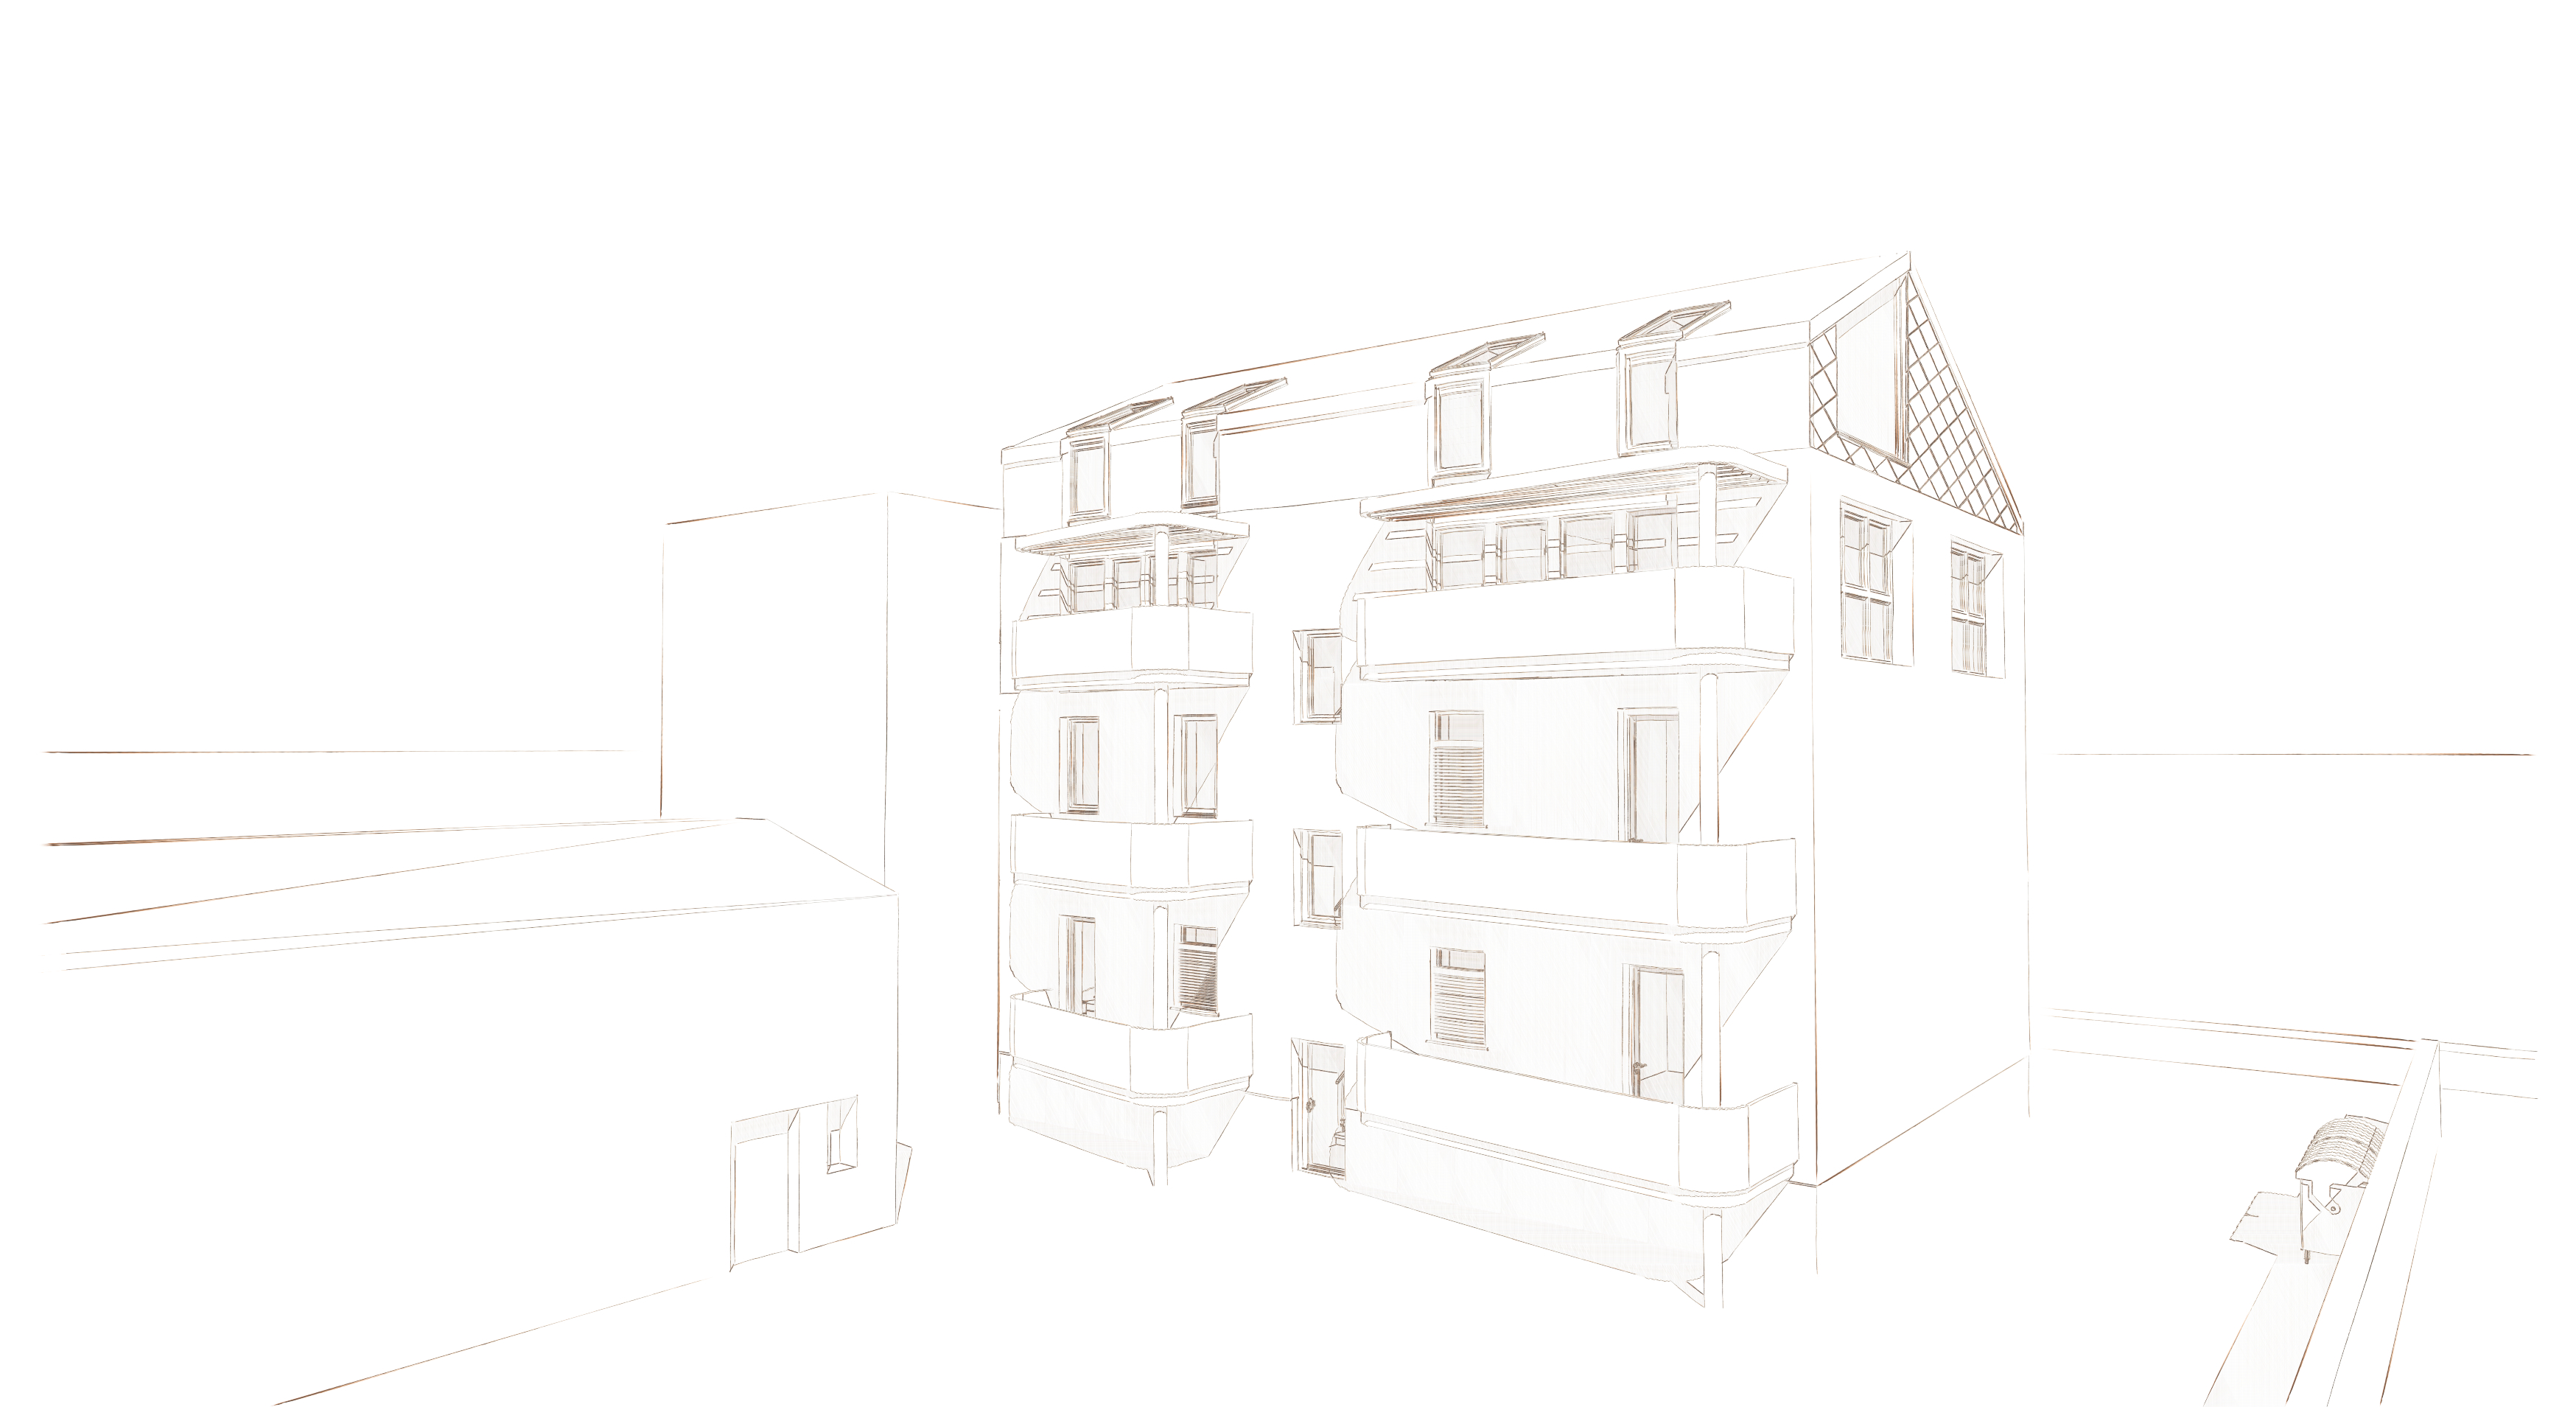 Entwurfsphase Perspektive 2